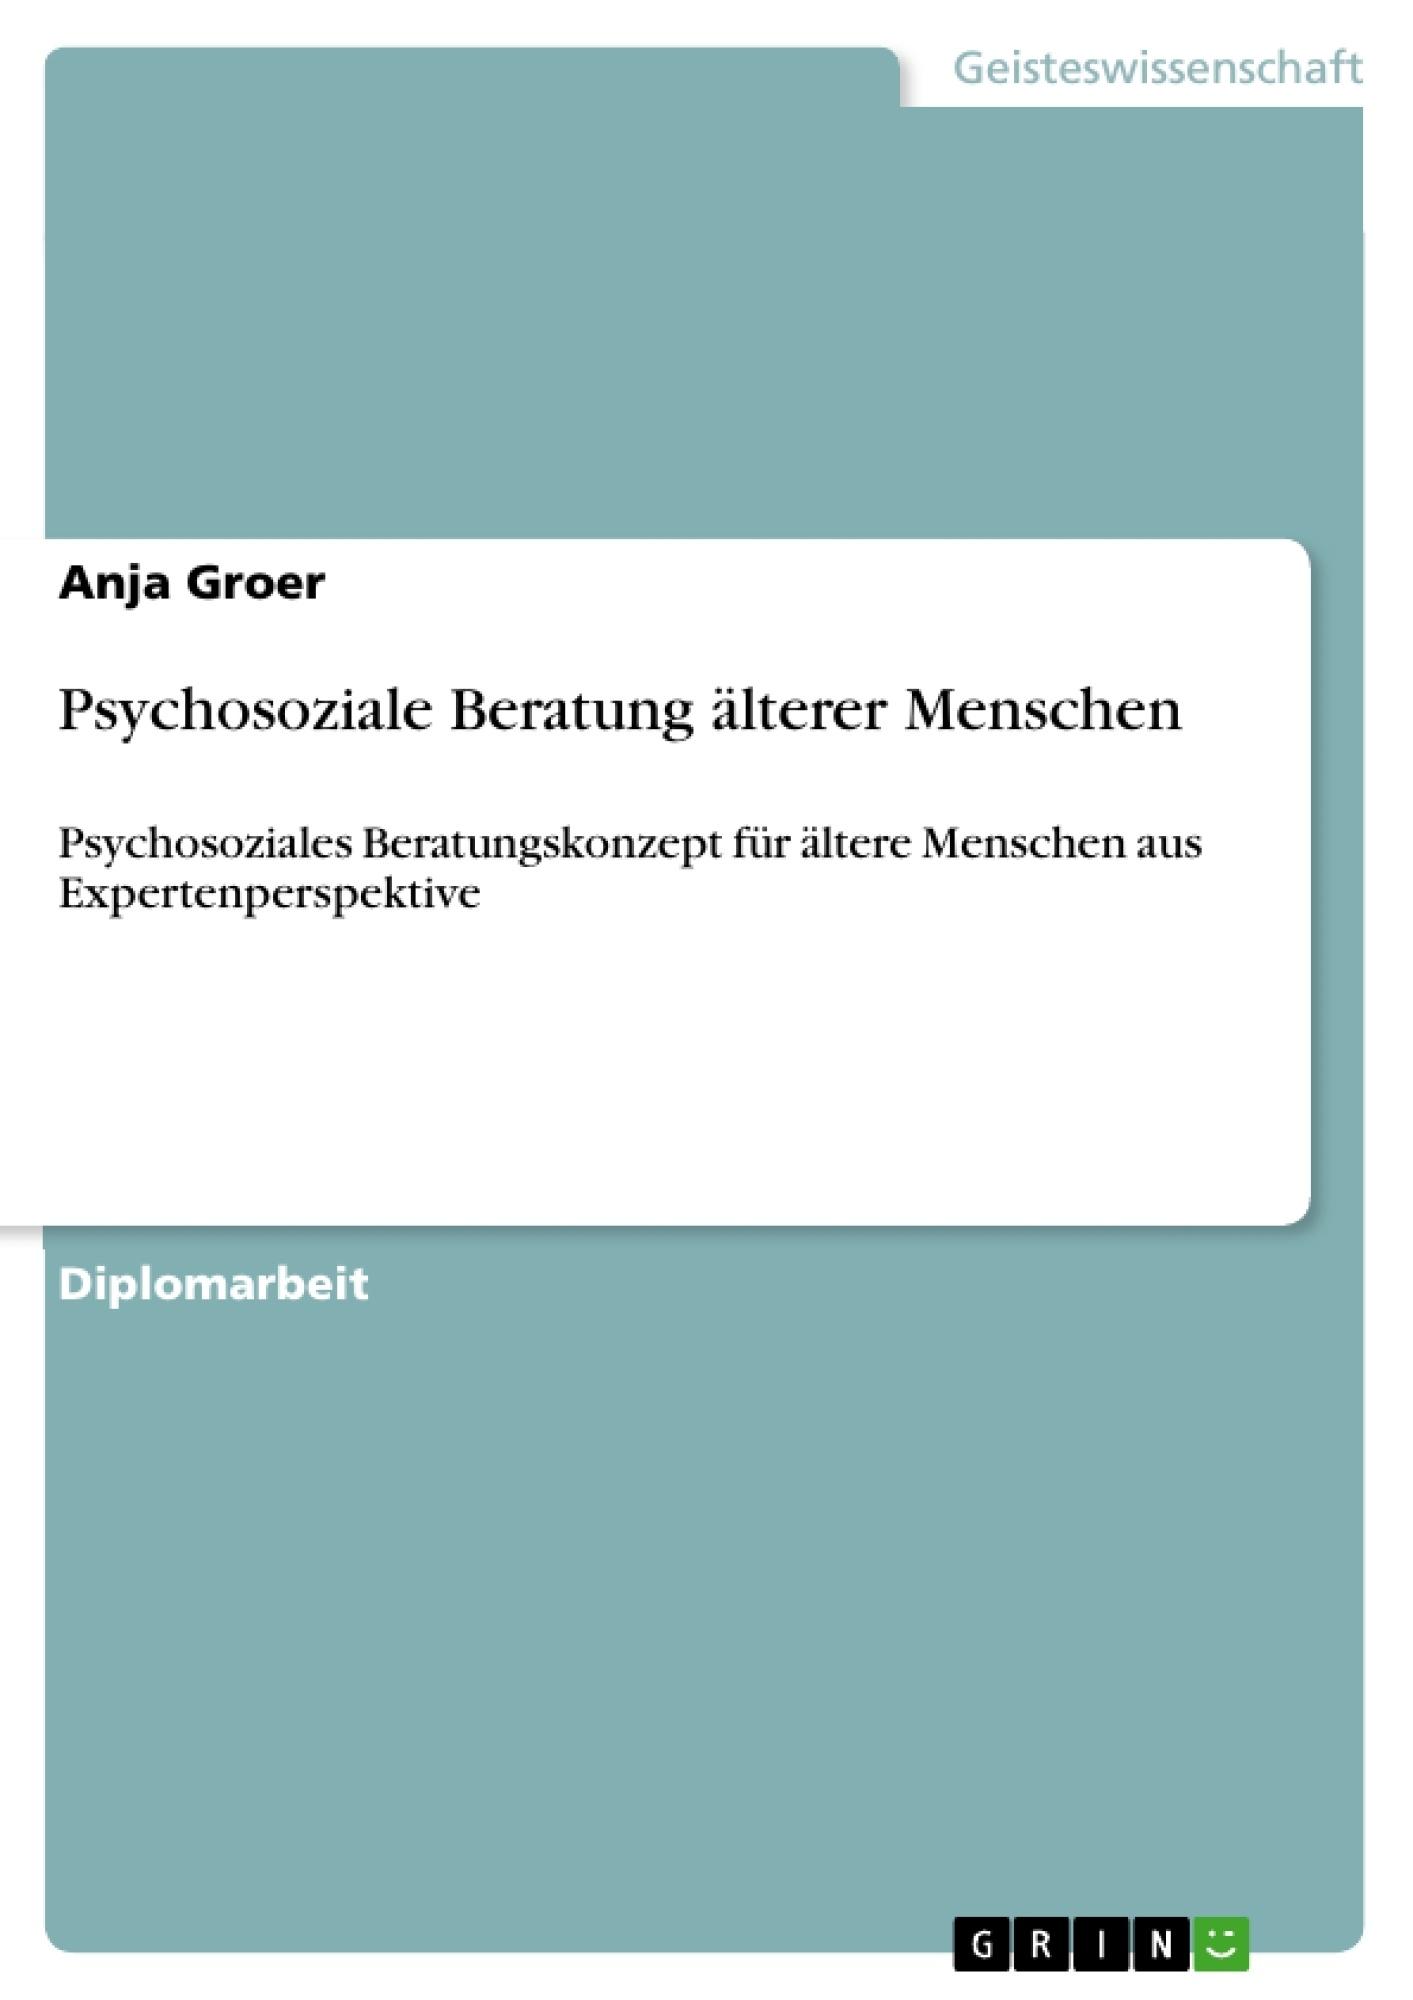 Titel: Psychosoziale Beratung älterer Menschen